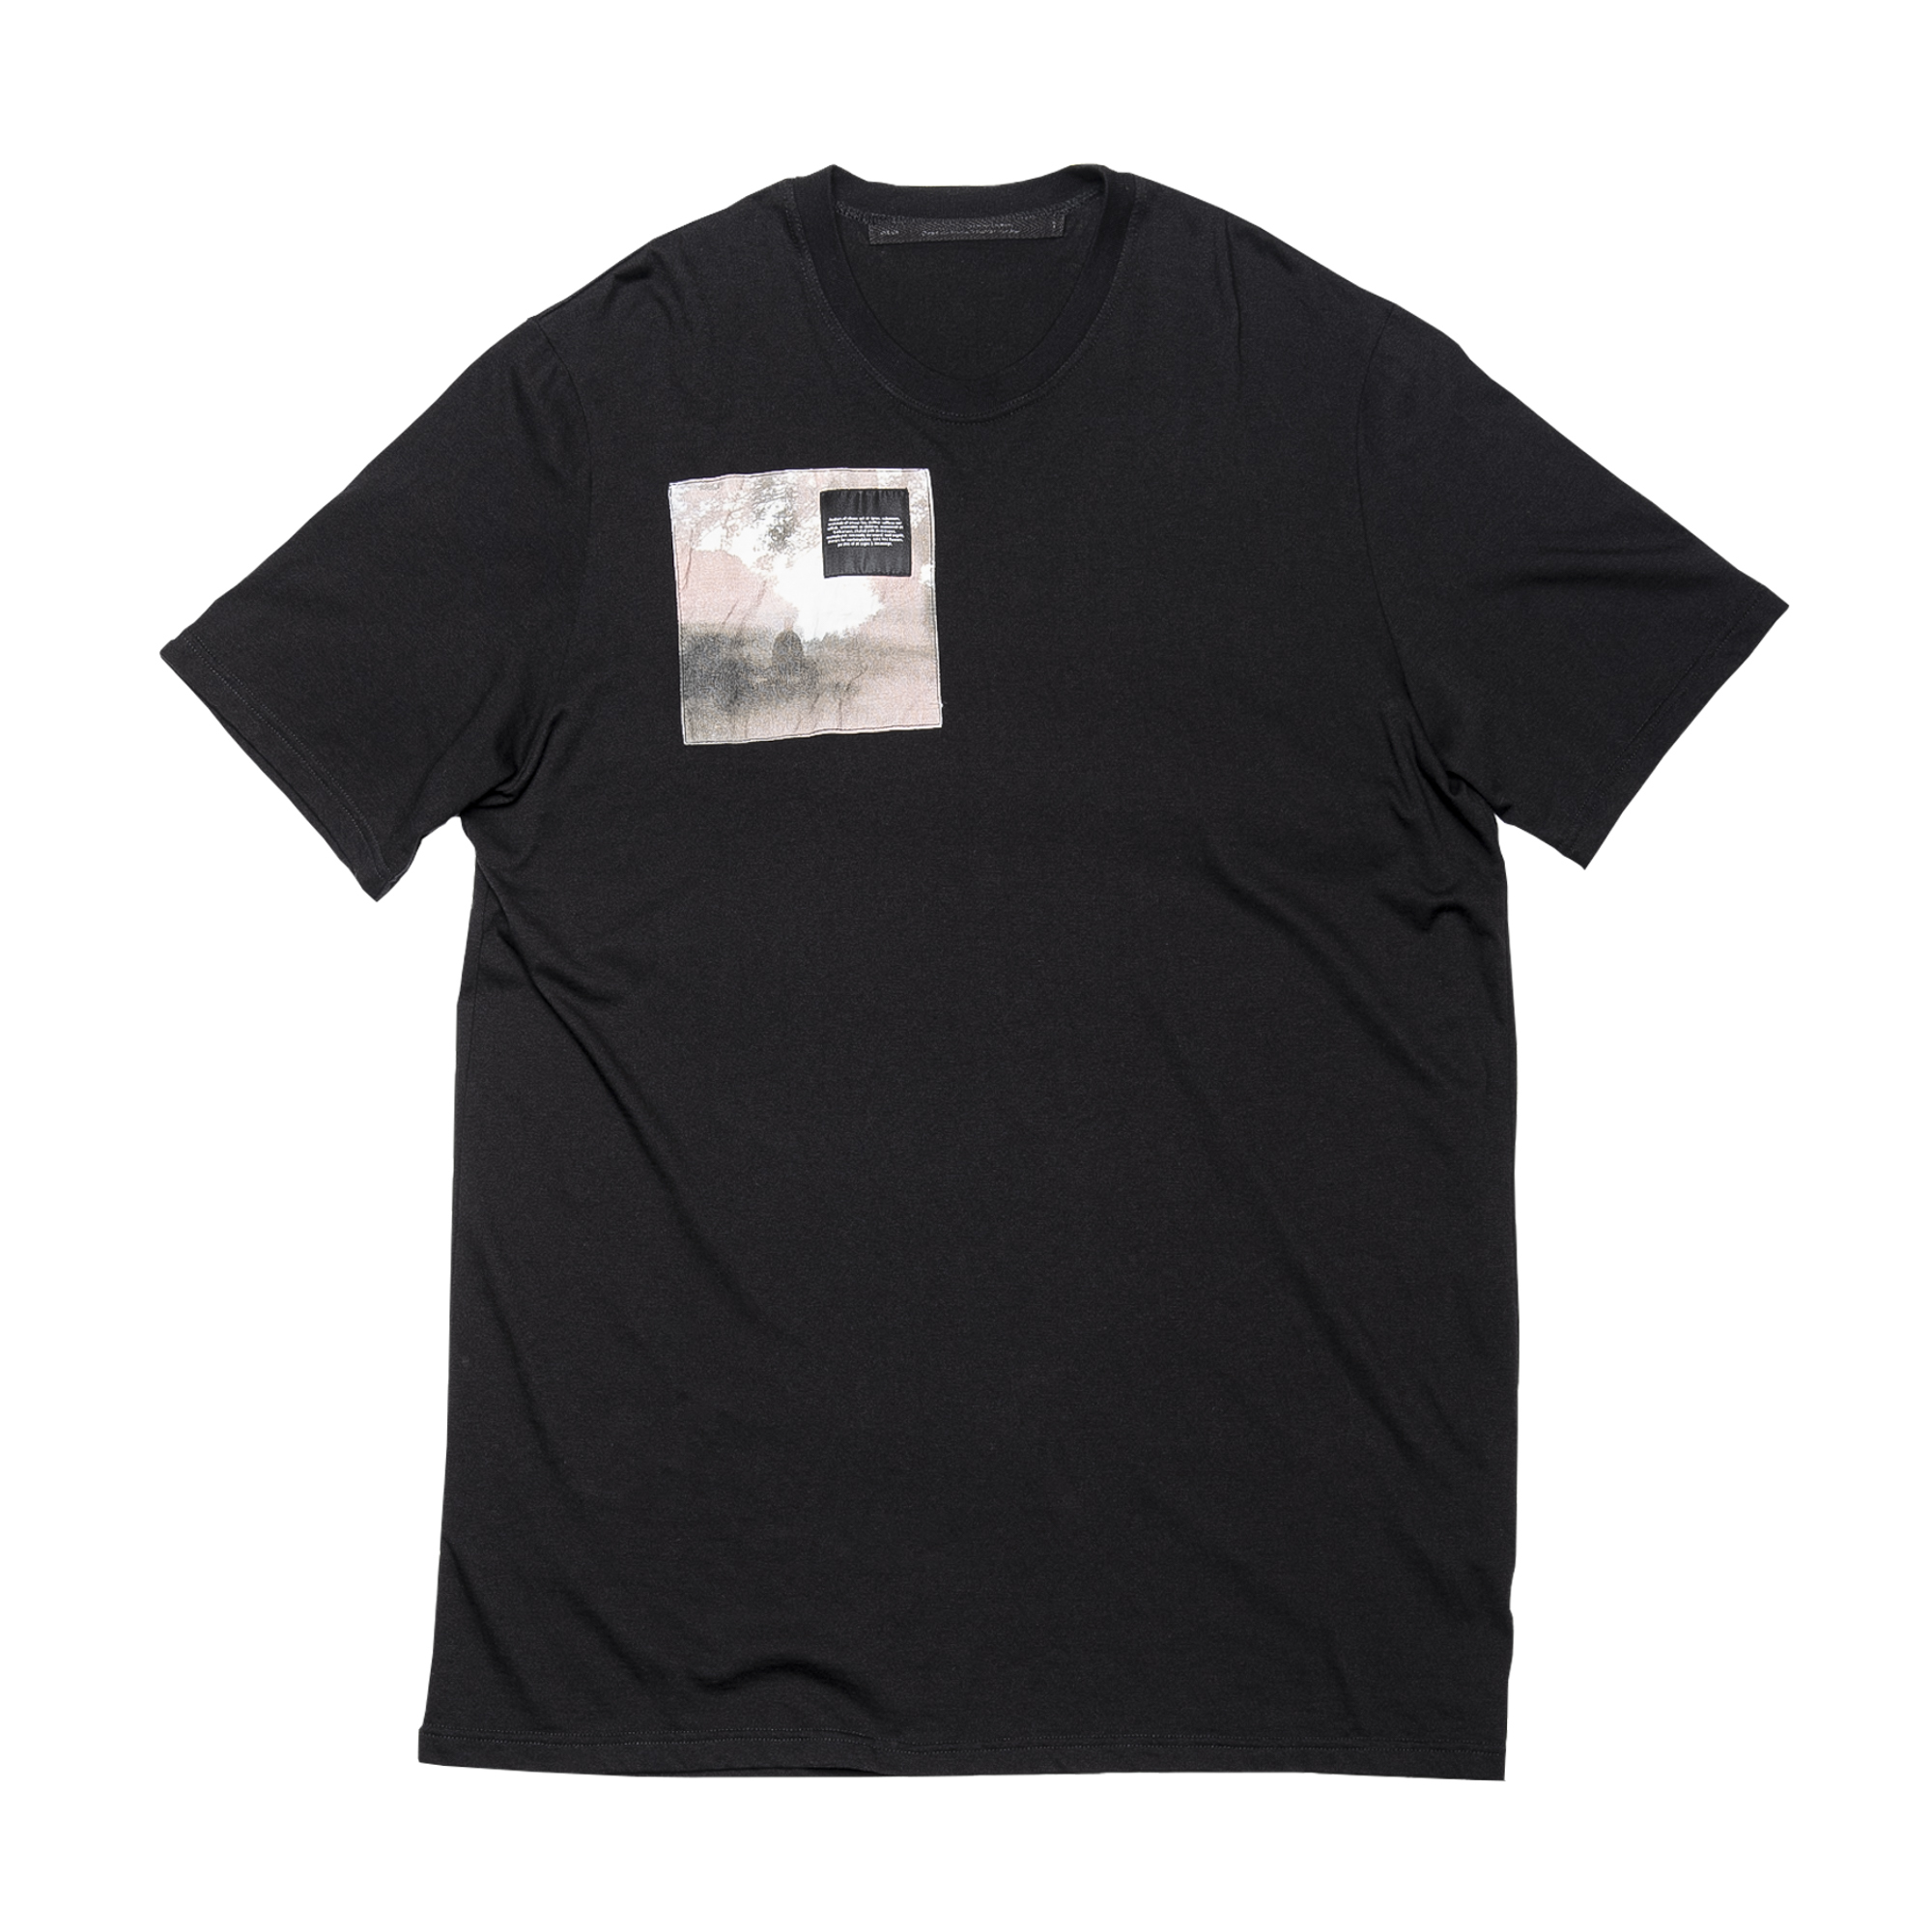 687CPM2-BLACK / パッチプリントTシャツ